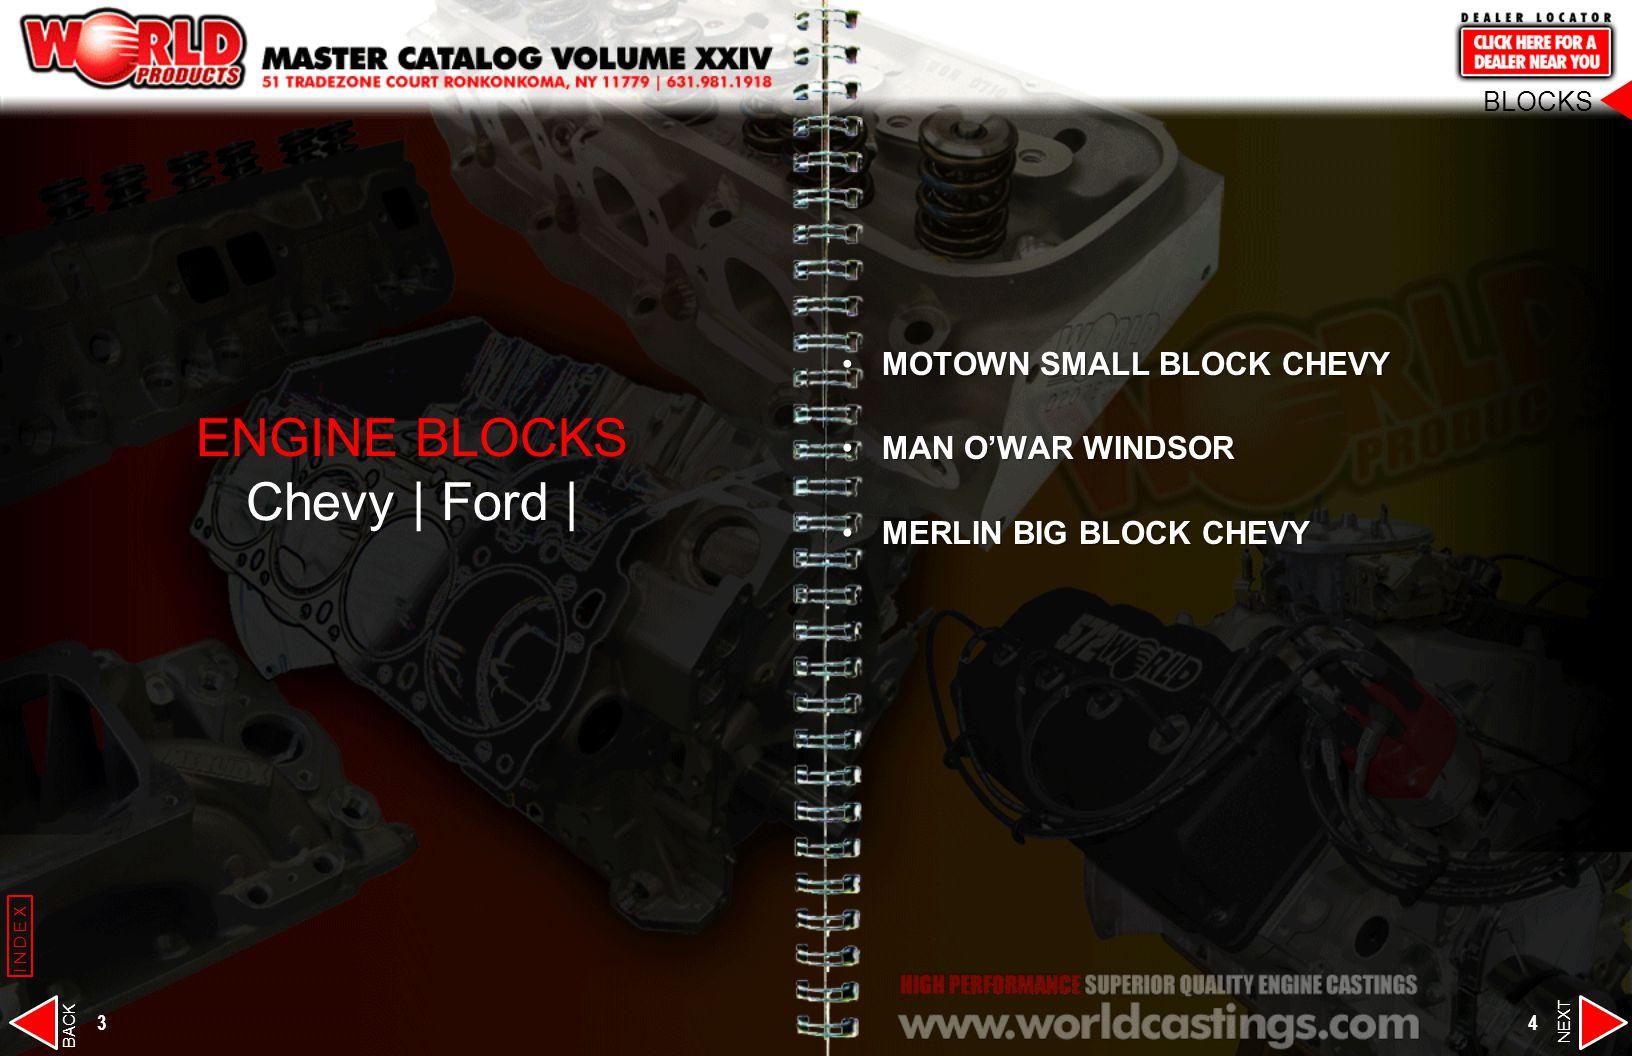 3 4 MOTOWN SMALL BLOCK CHEVYMOTOWN SMALL BLOCK CHEVY MAN OWAR WINDSORMAN OWAR WINDSOR MERLIN BIG BLOCK CHEVYMERLIN BIG BLOCK CHEVY ENGINE BLOCKS Chevy